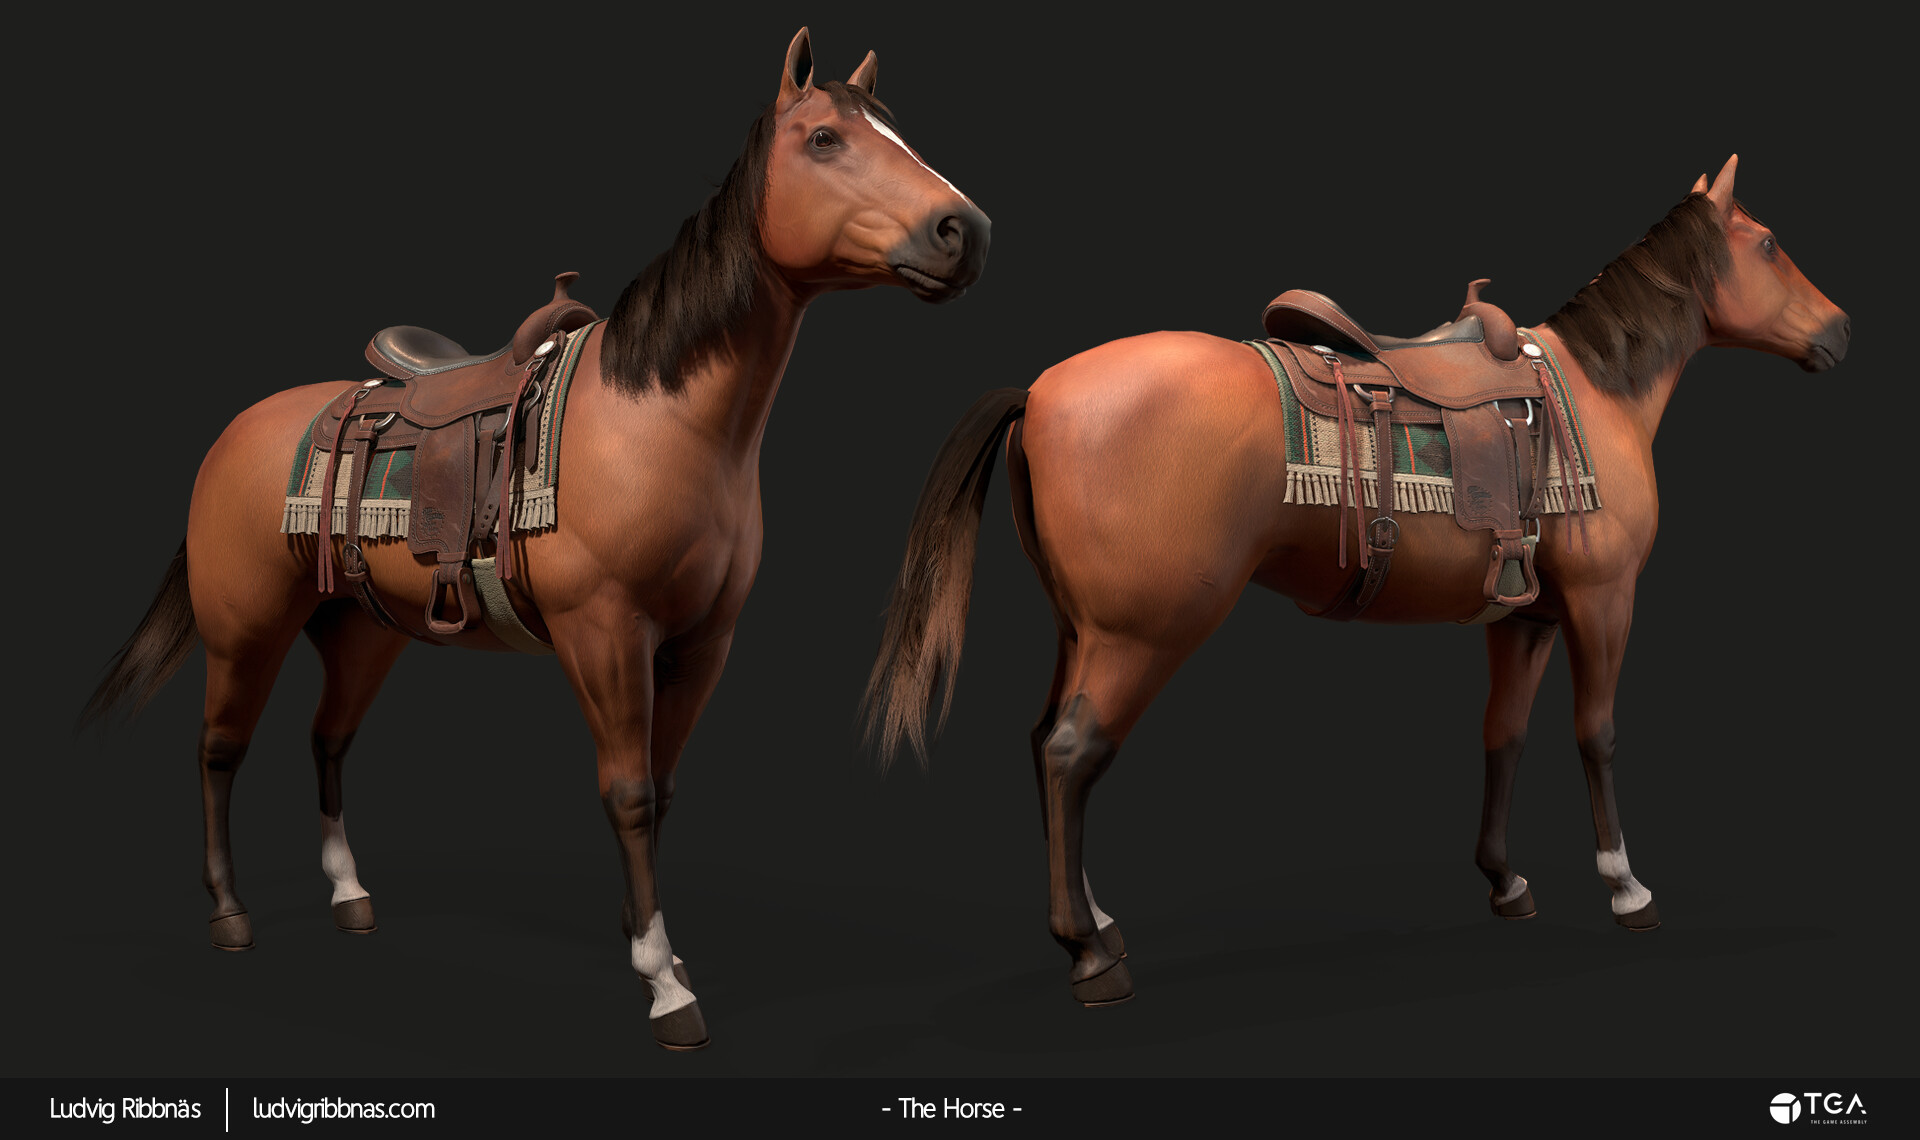 Ludvig ribbnas thehorse twohorses